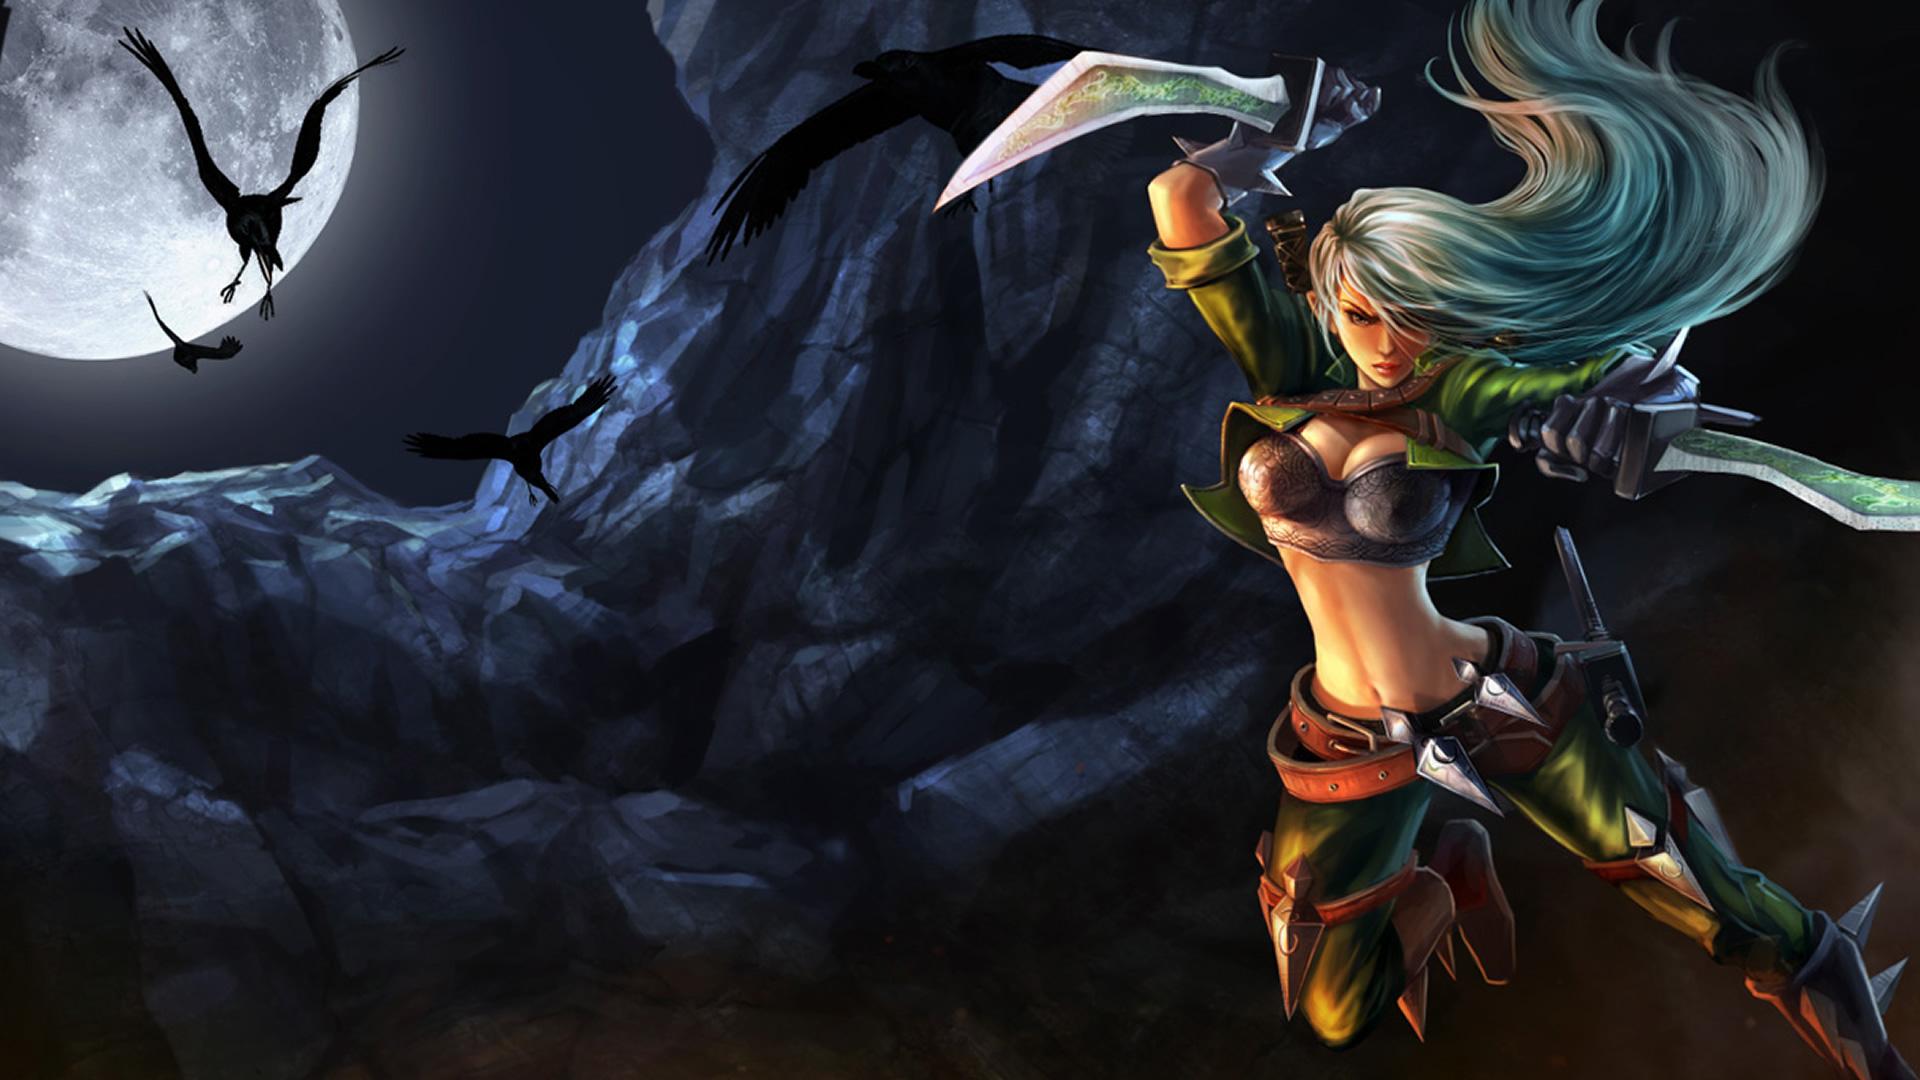 LeagueSplash - League of Legends skins, wallpapers and artwork